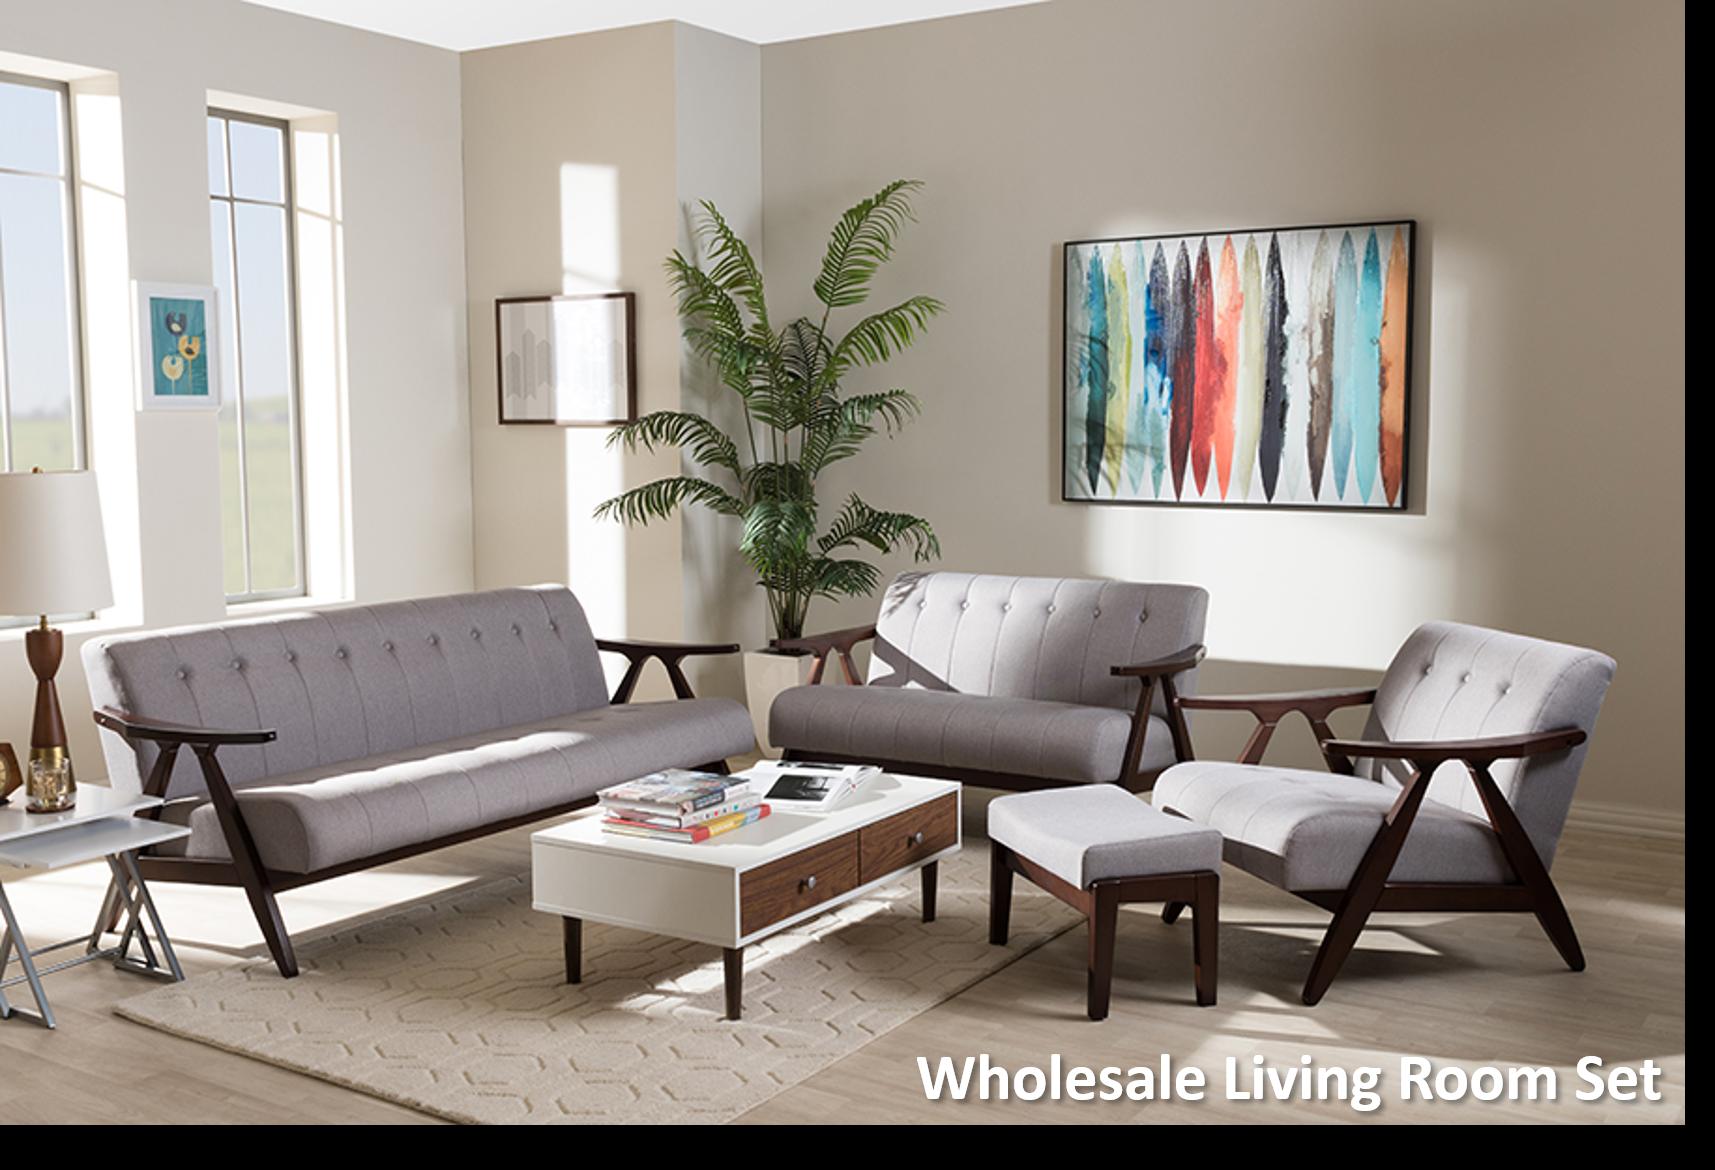 Wholesale furniture restaurant commercial